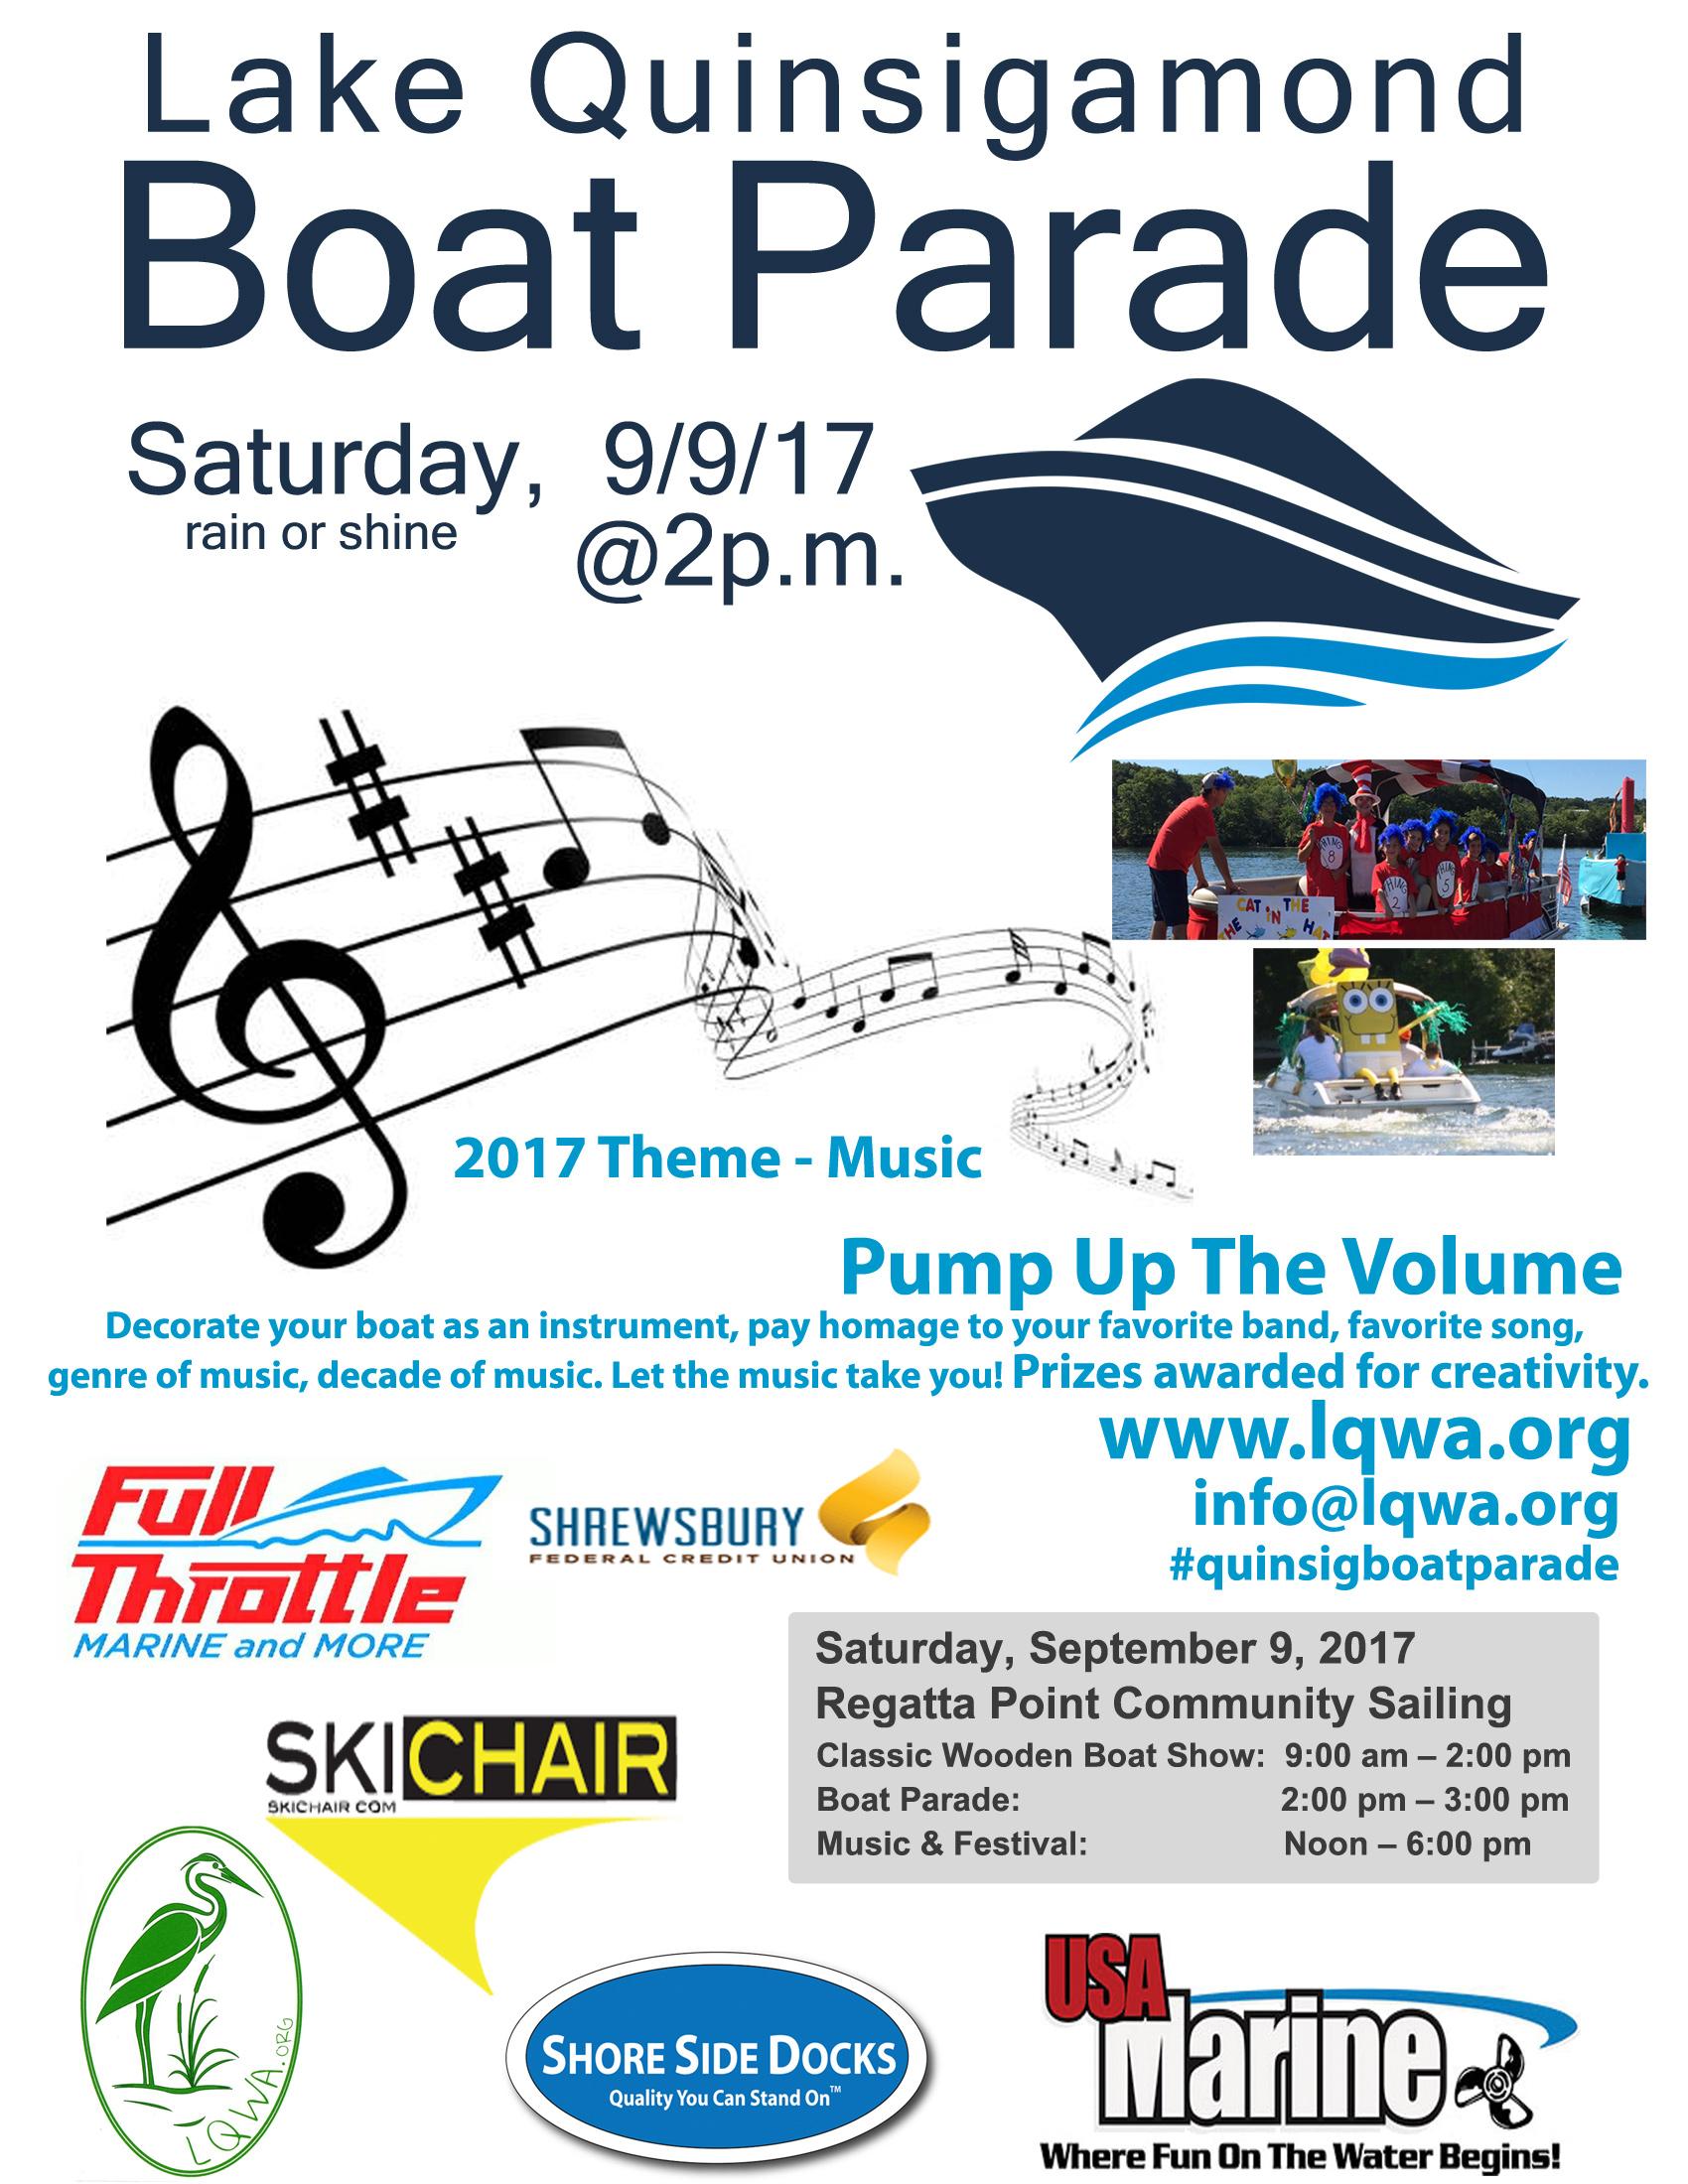 boatparade9917final.jpg